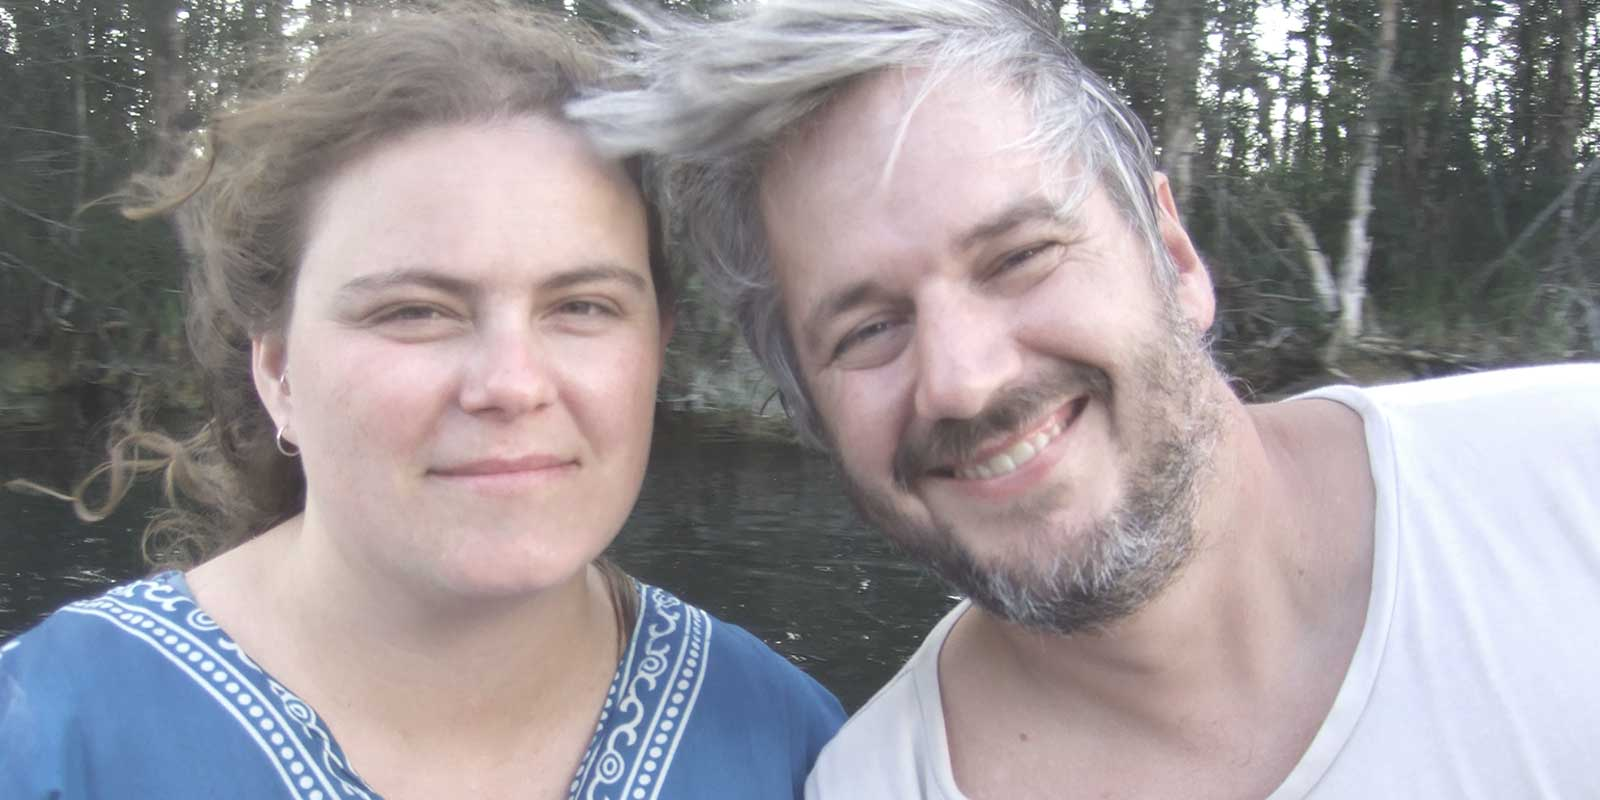 Co-founders of Cheeky Tiki Jamie Wilson and Anjy Cameron